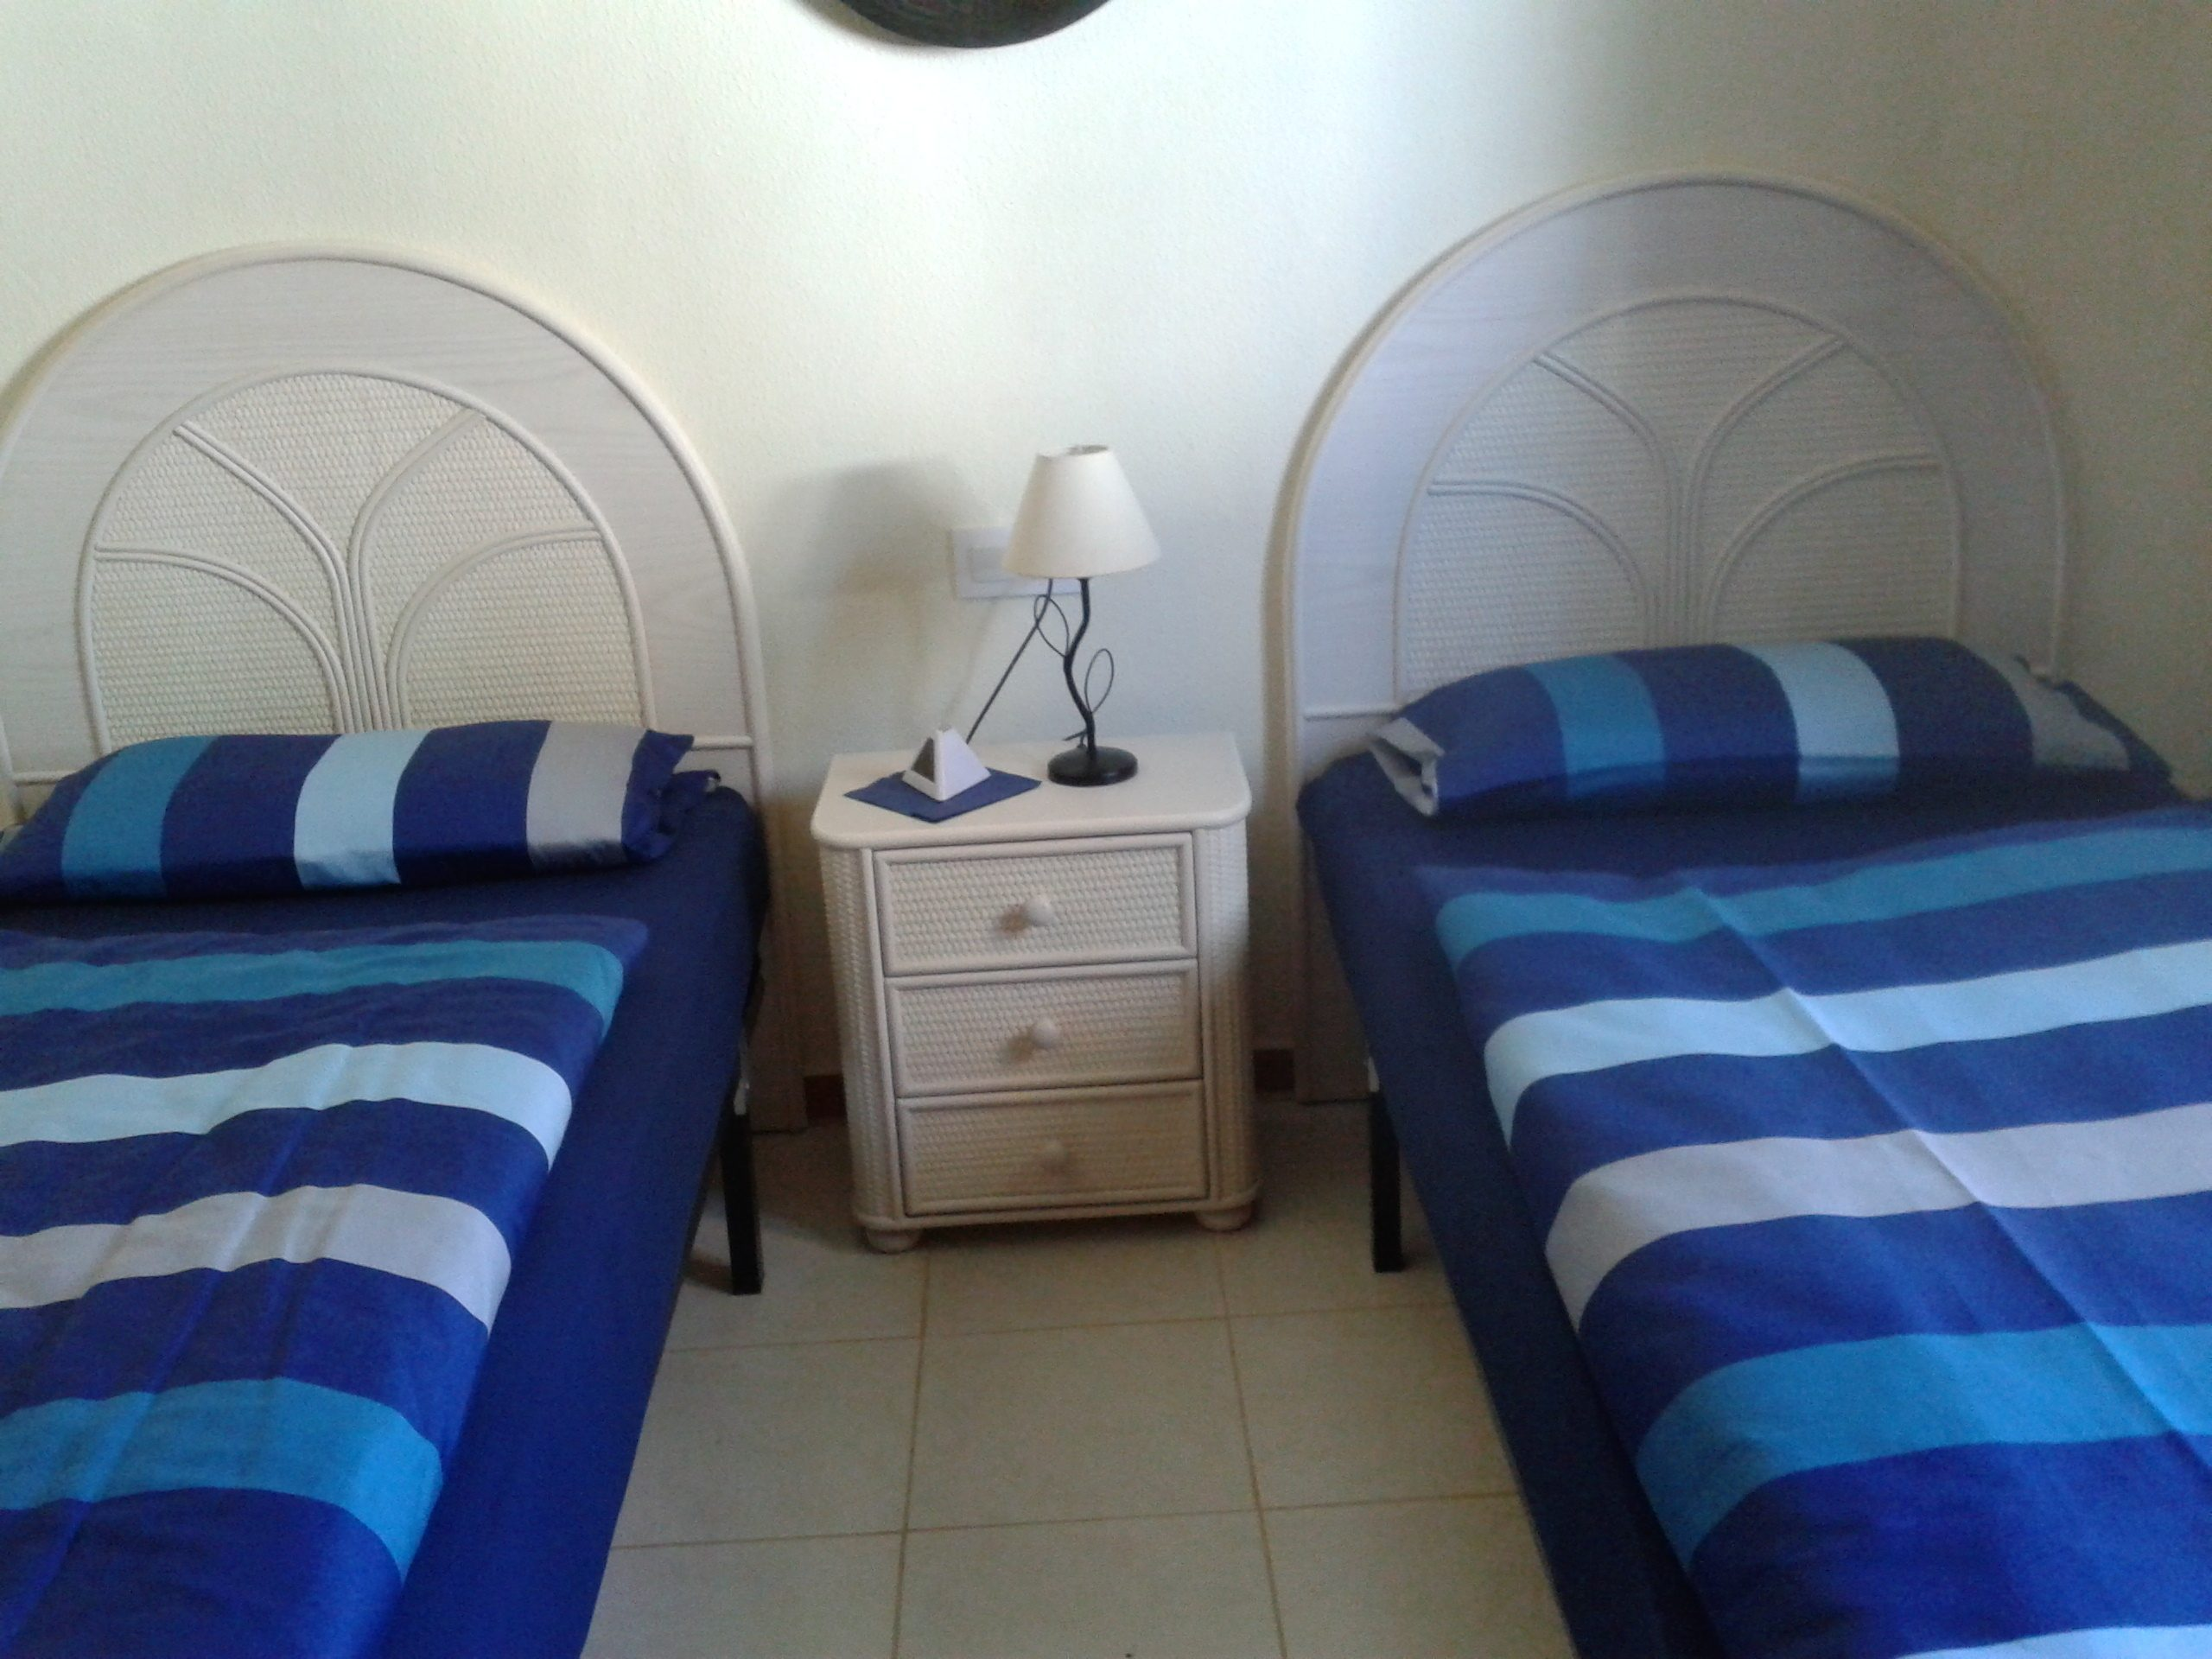 Bild 9 - Costa Blanca Ferienhaus Trixi mit Pool - Objekt 2922-1